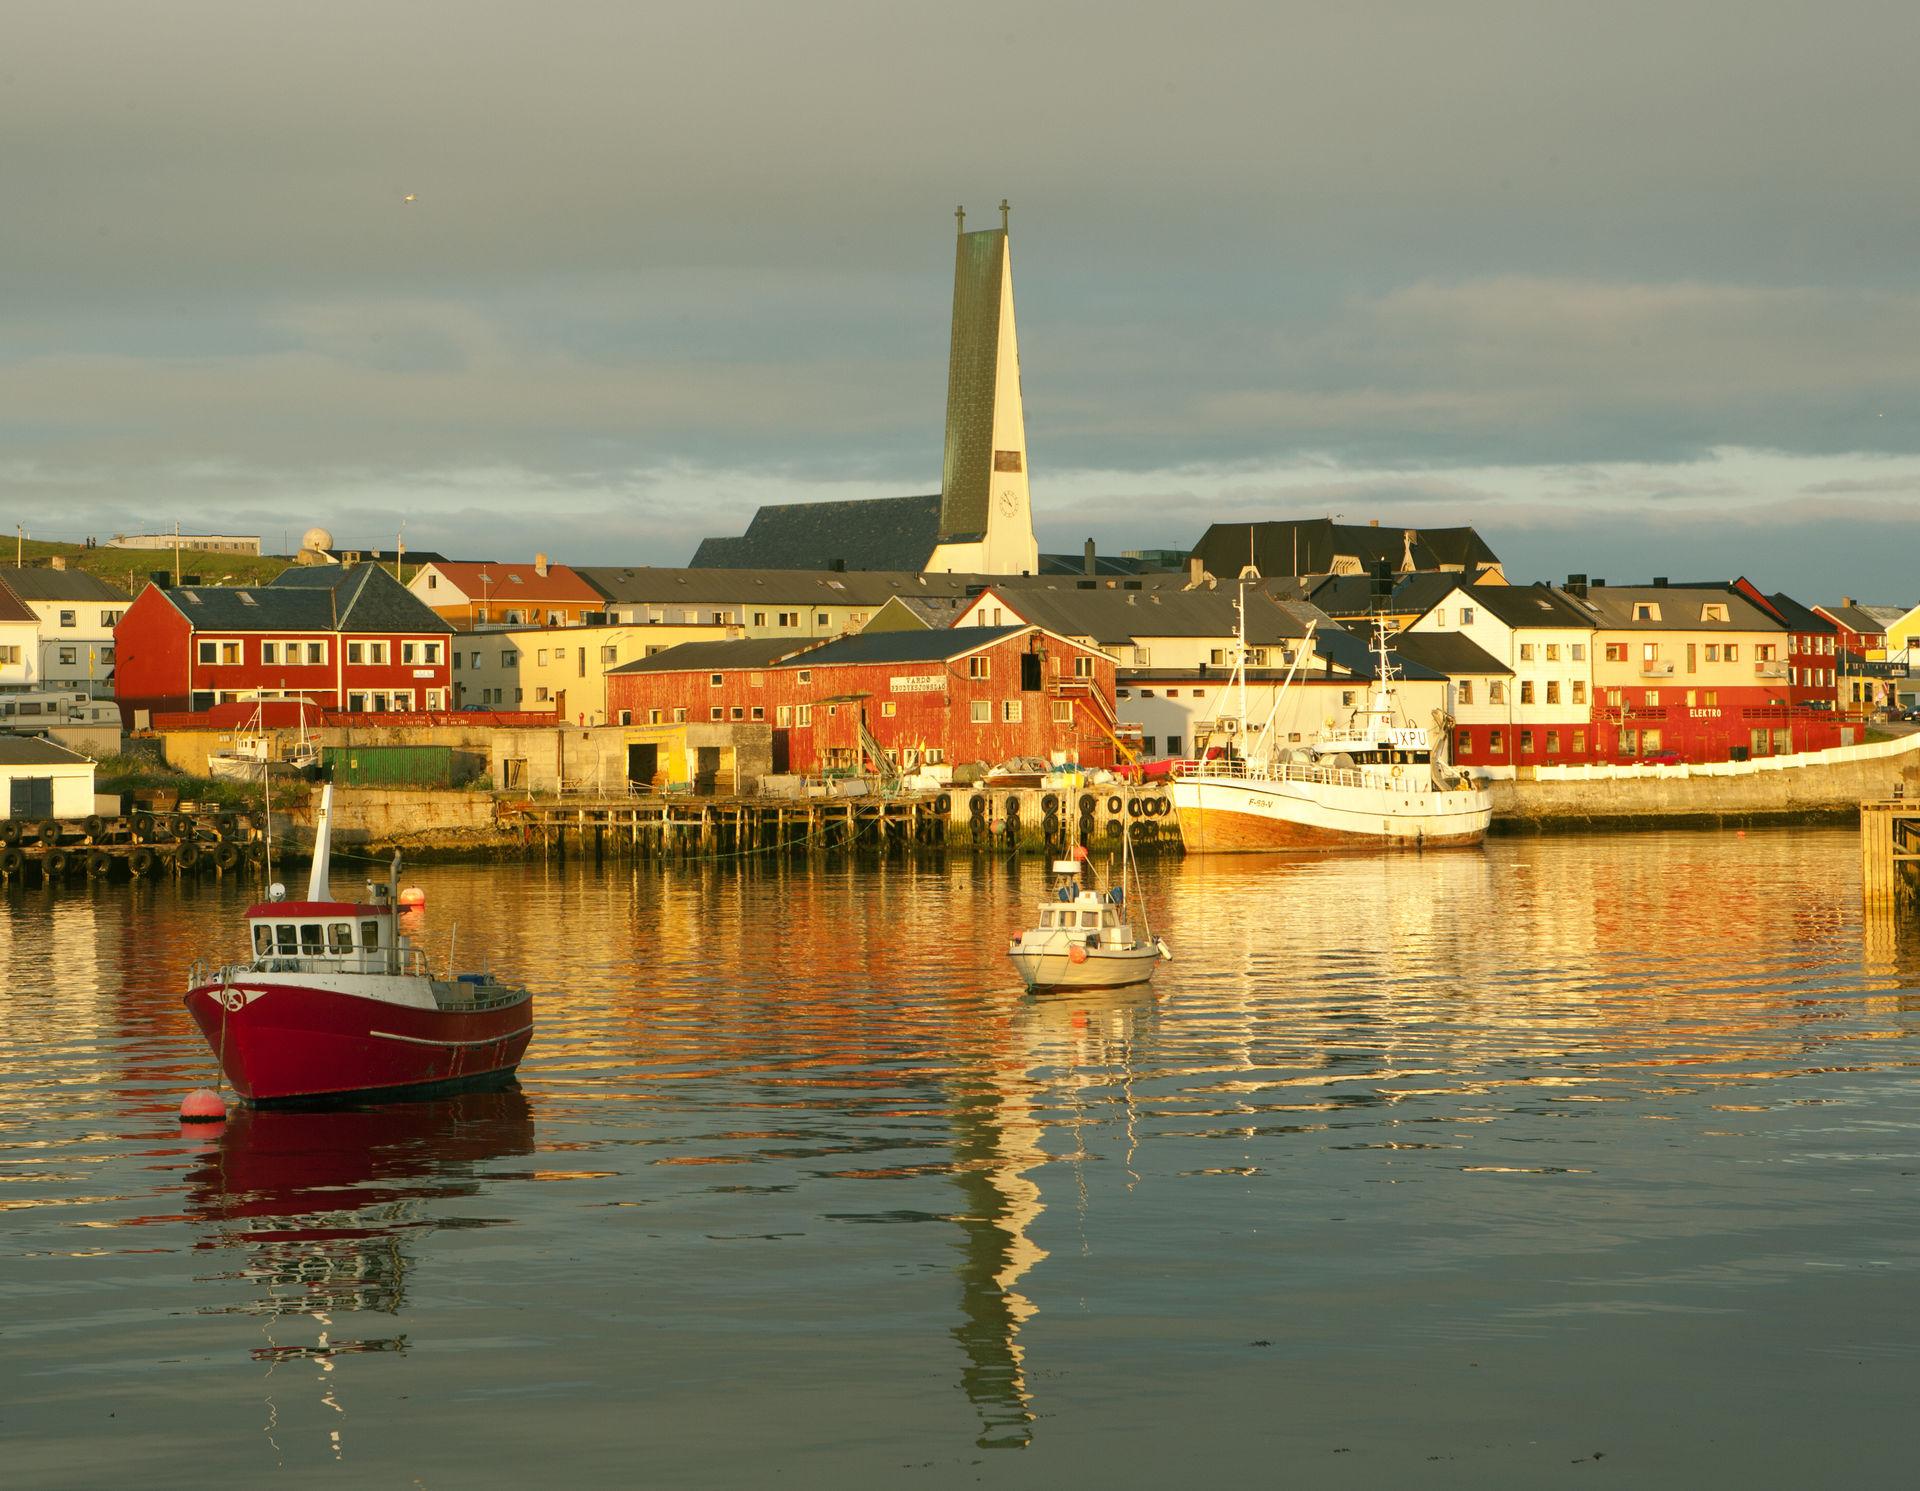 Midnattsstemning i Vardø havn © Ole Jørgen Liodden